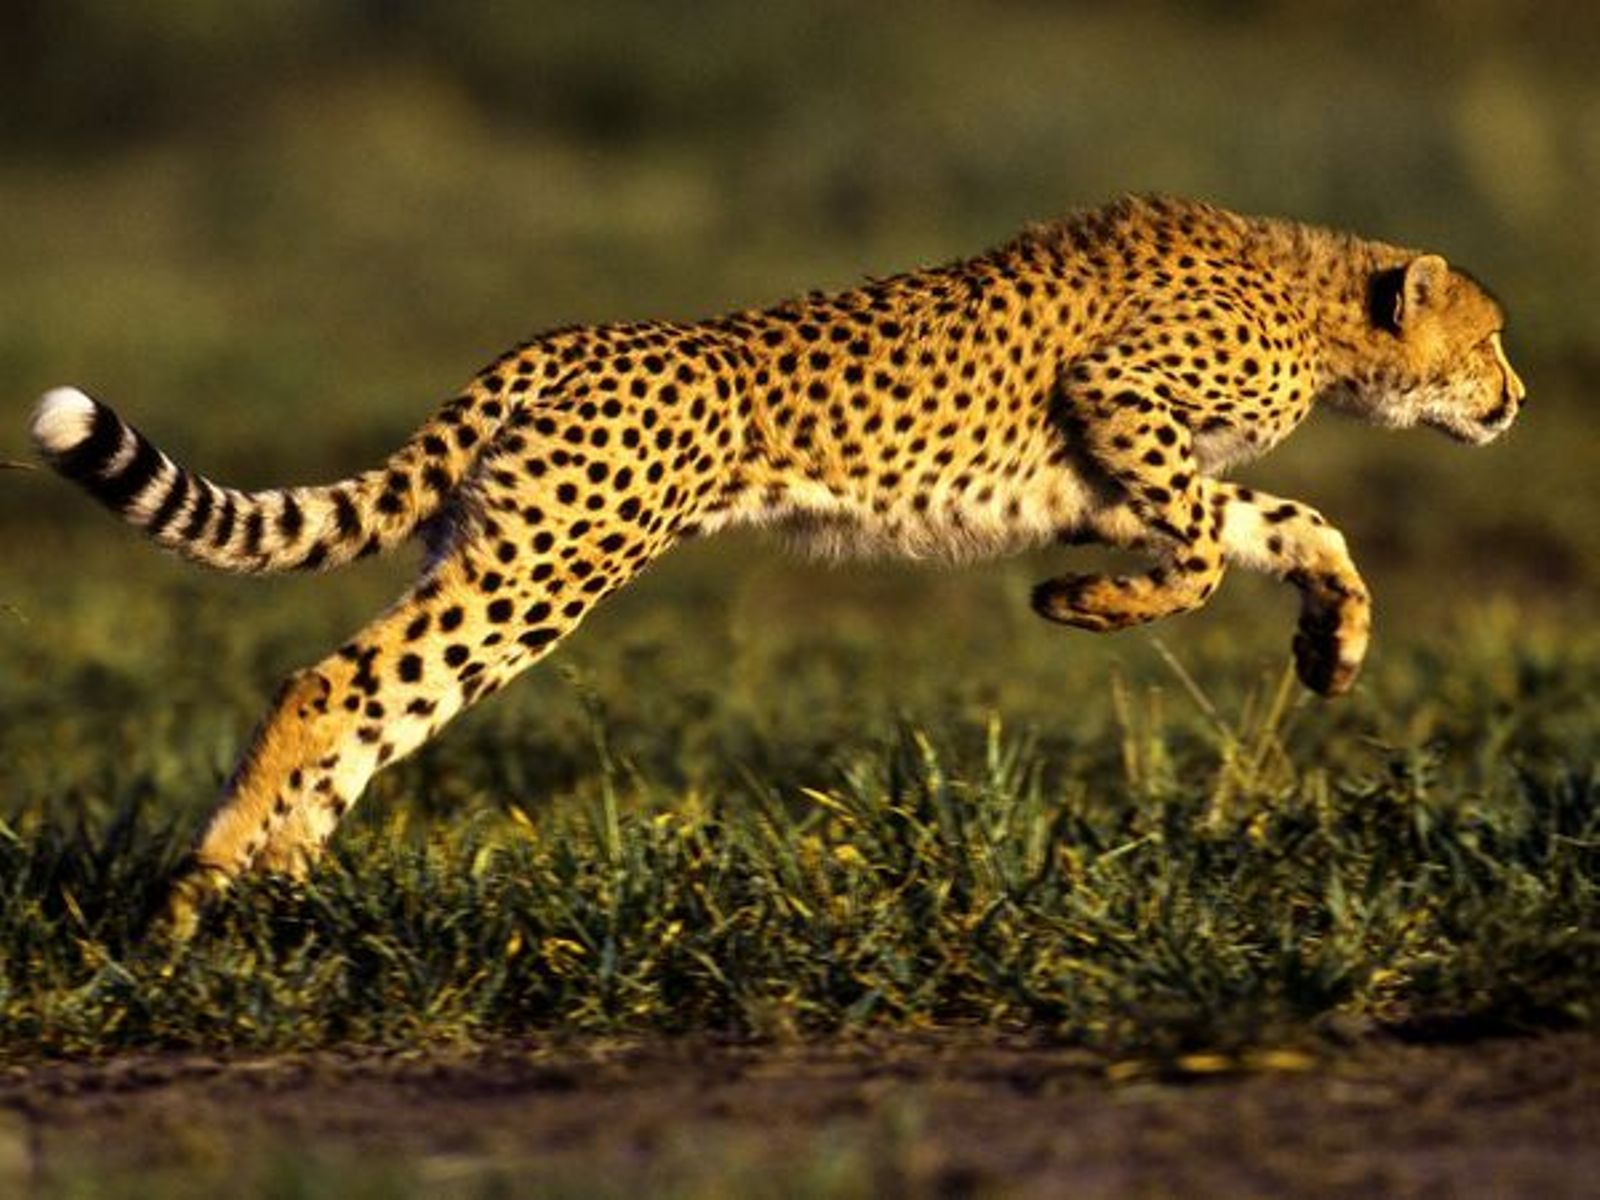 Jaguar Hd Wallpapers Running The Cool Art Cheetah Pictures